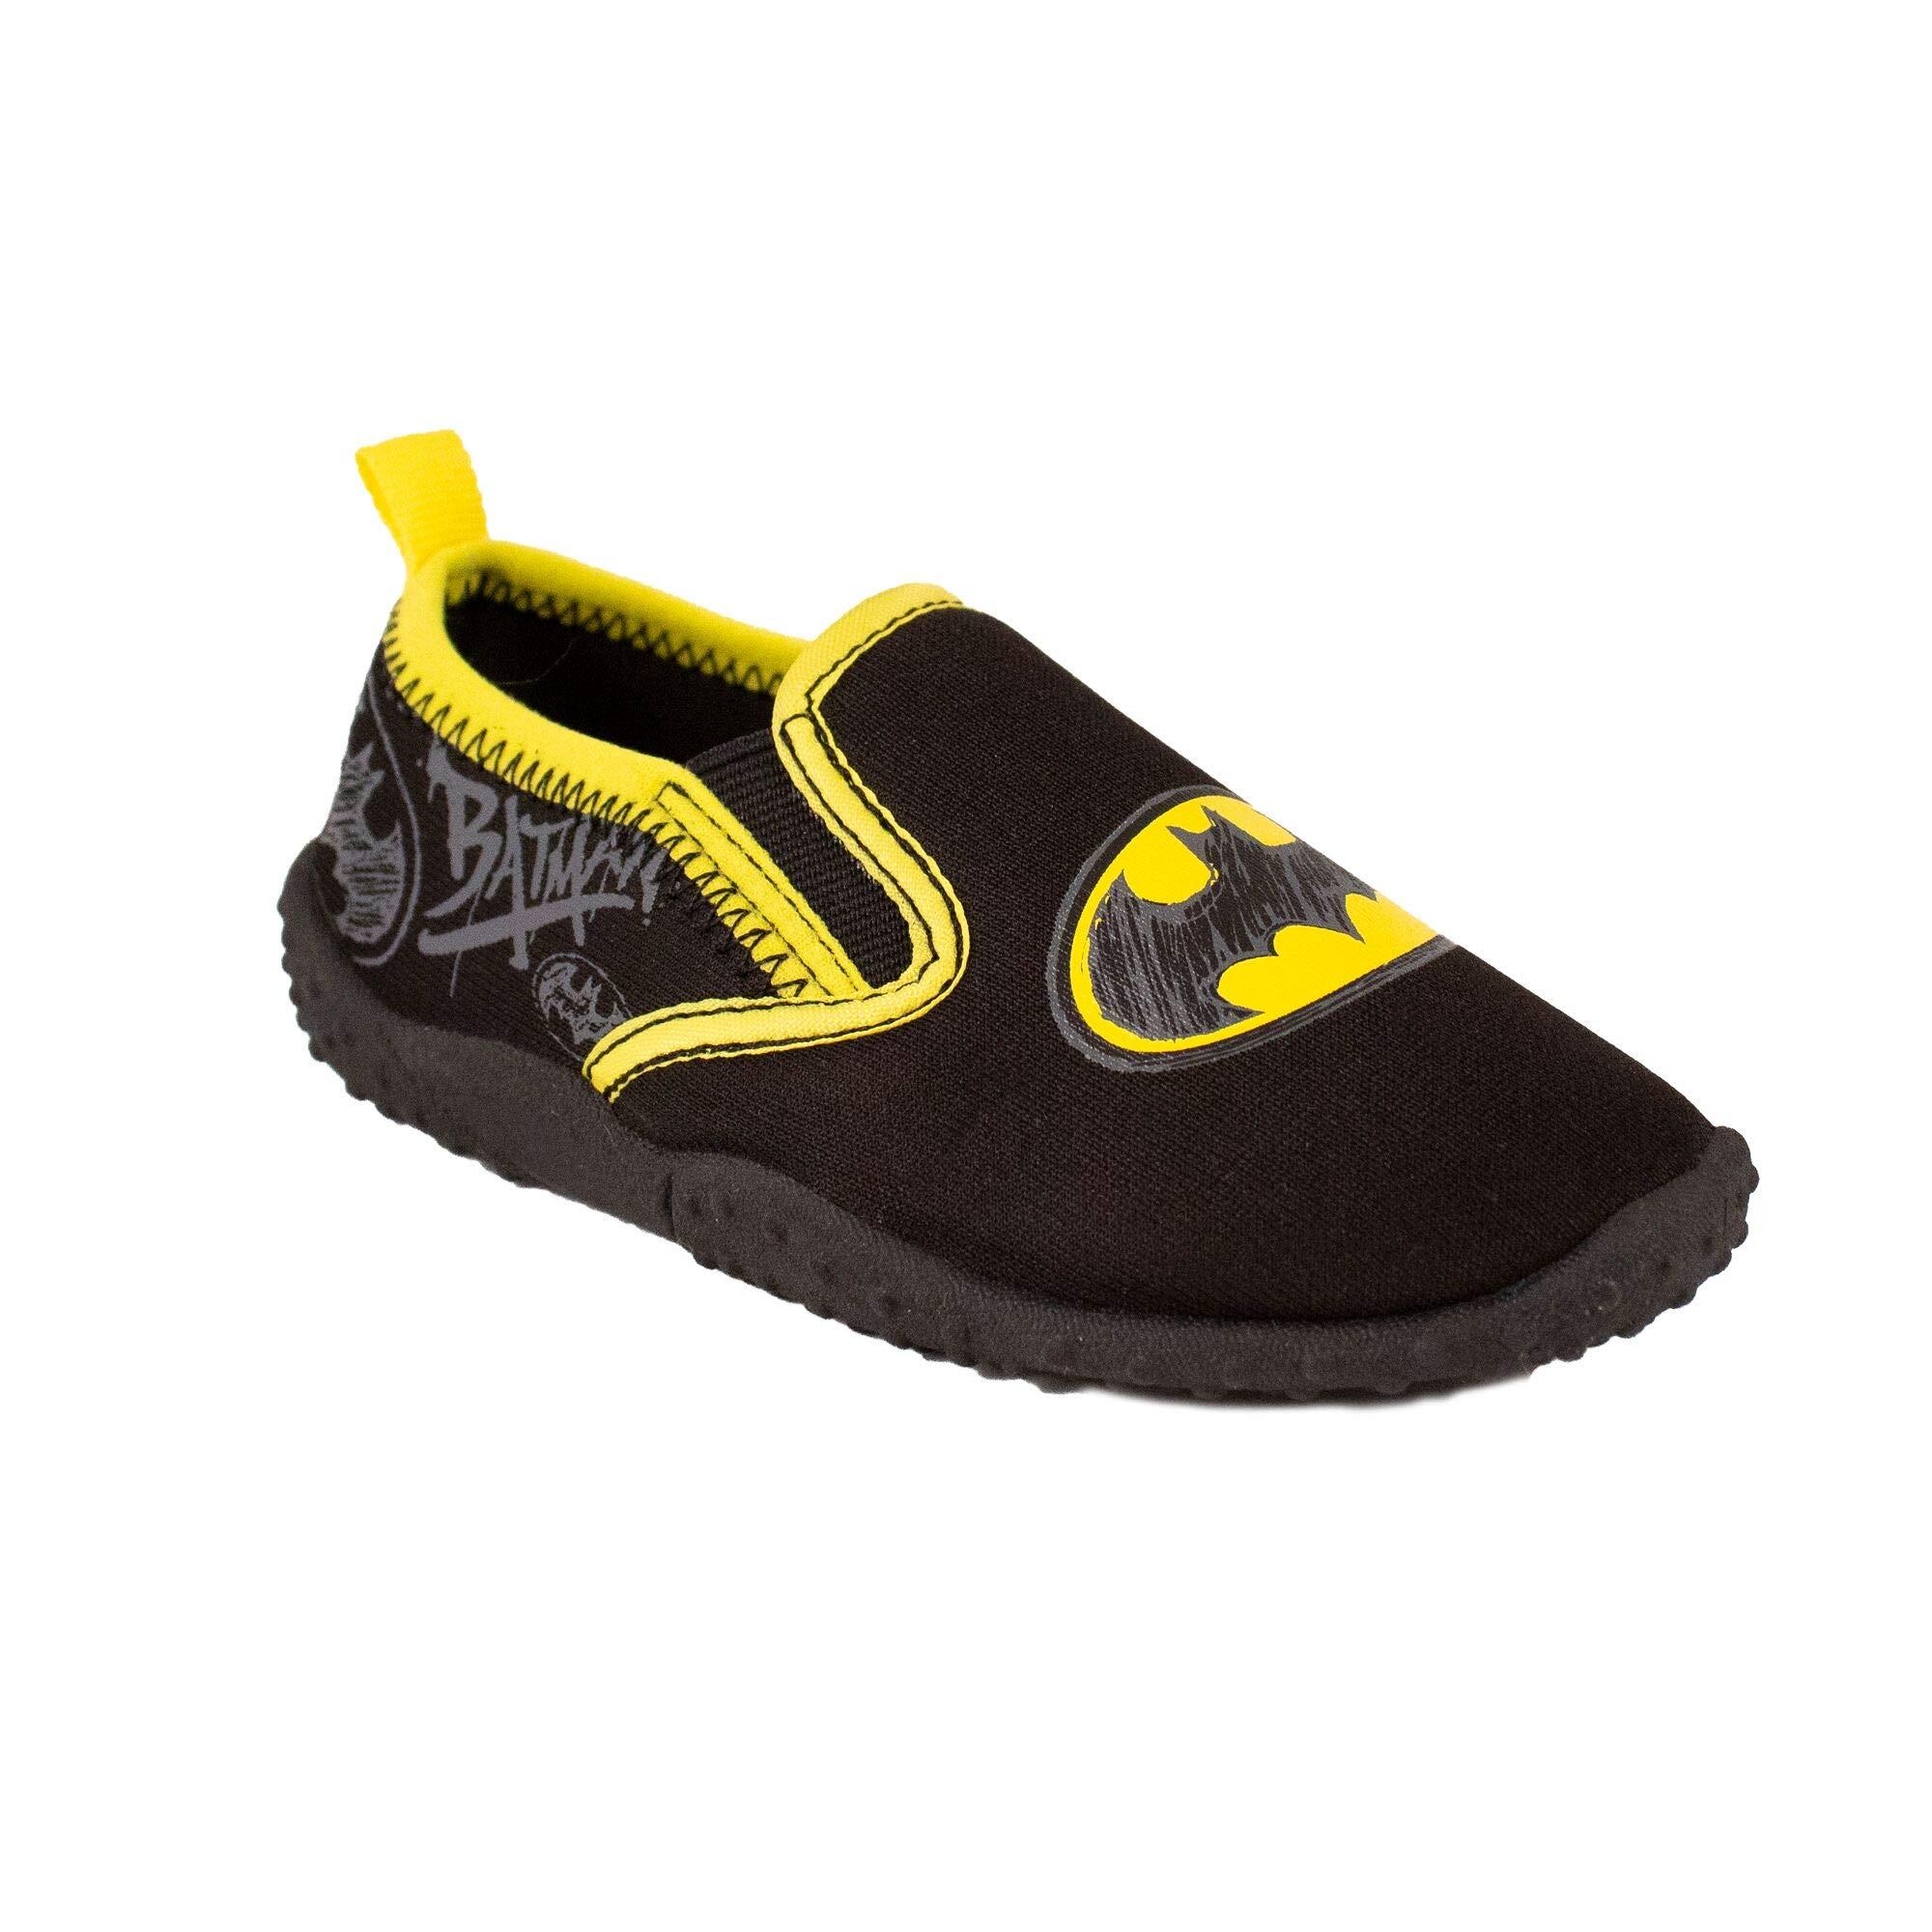 Favorite Characters Batman Slip On Water Shoes Dual Sizes Black Toddler/Little Kid (Medium M)